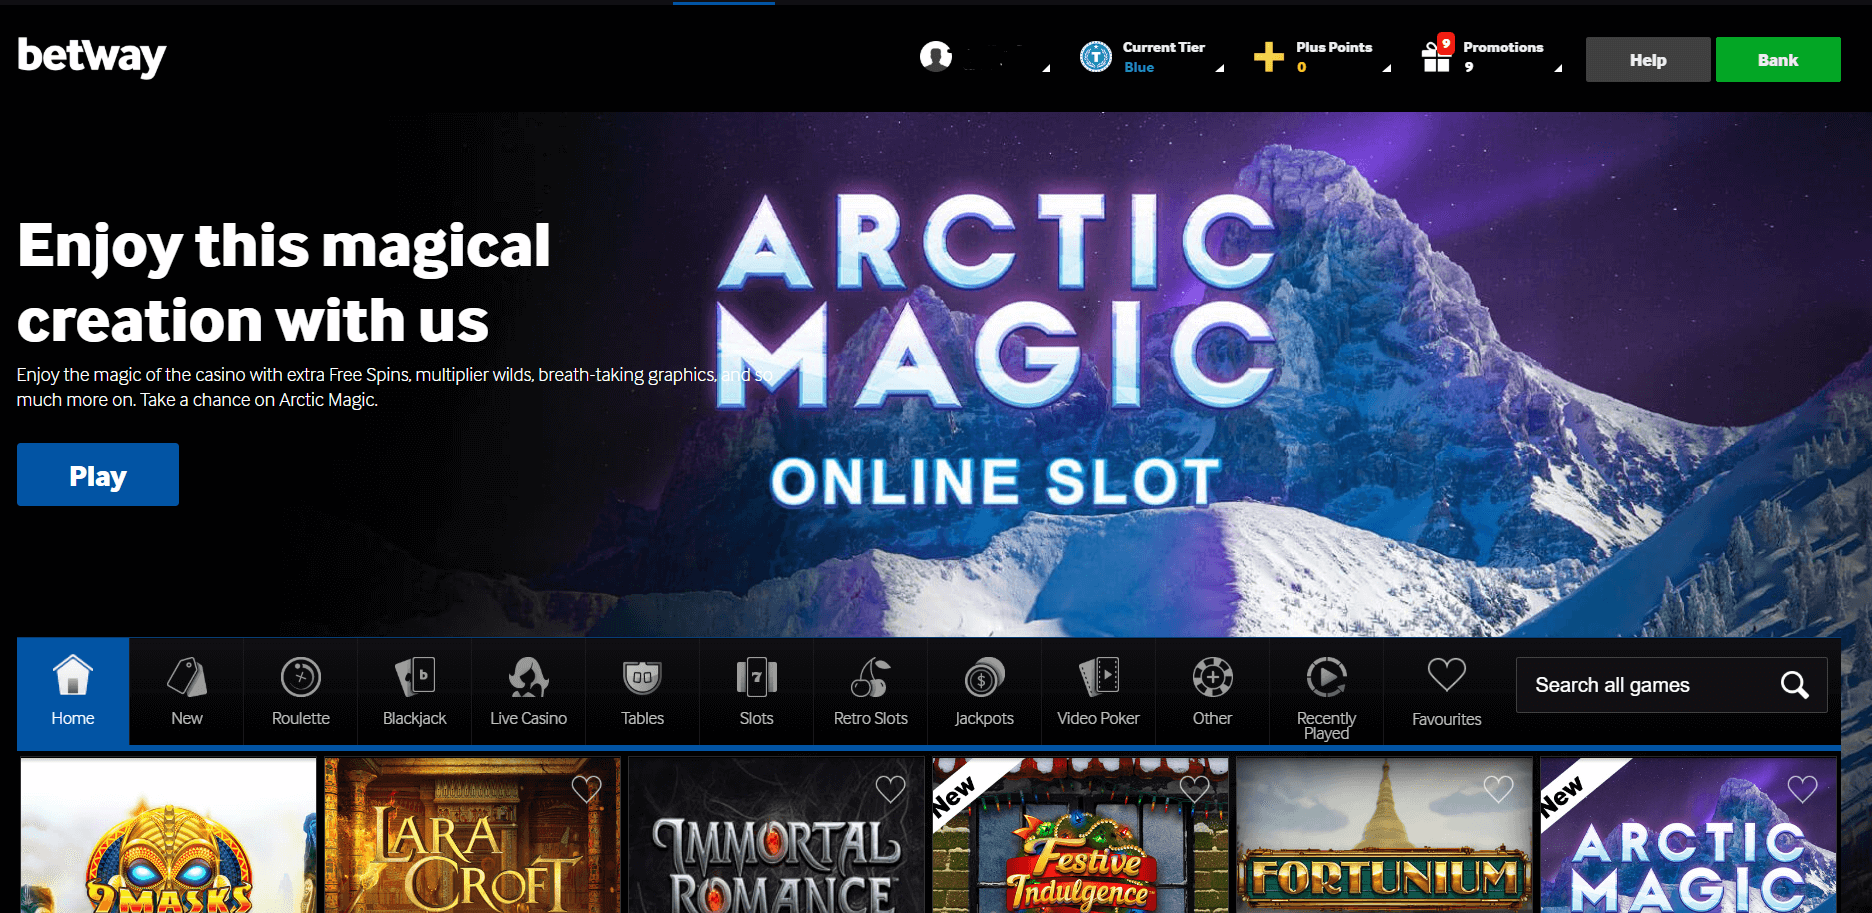 betway casino homepage